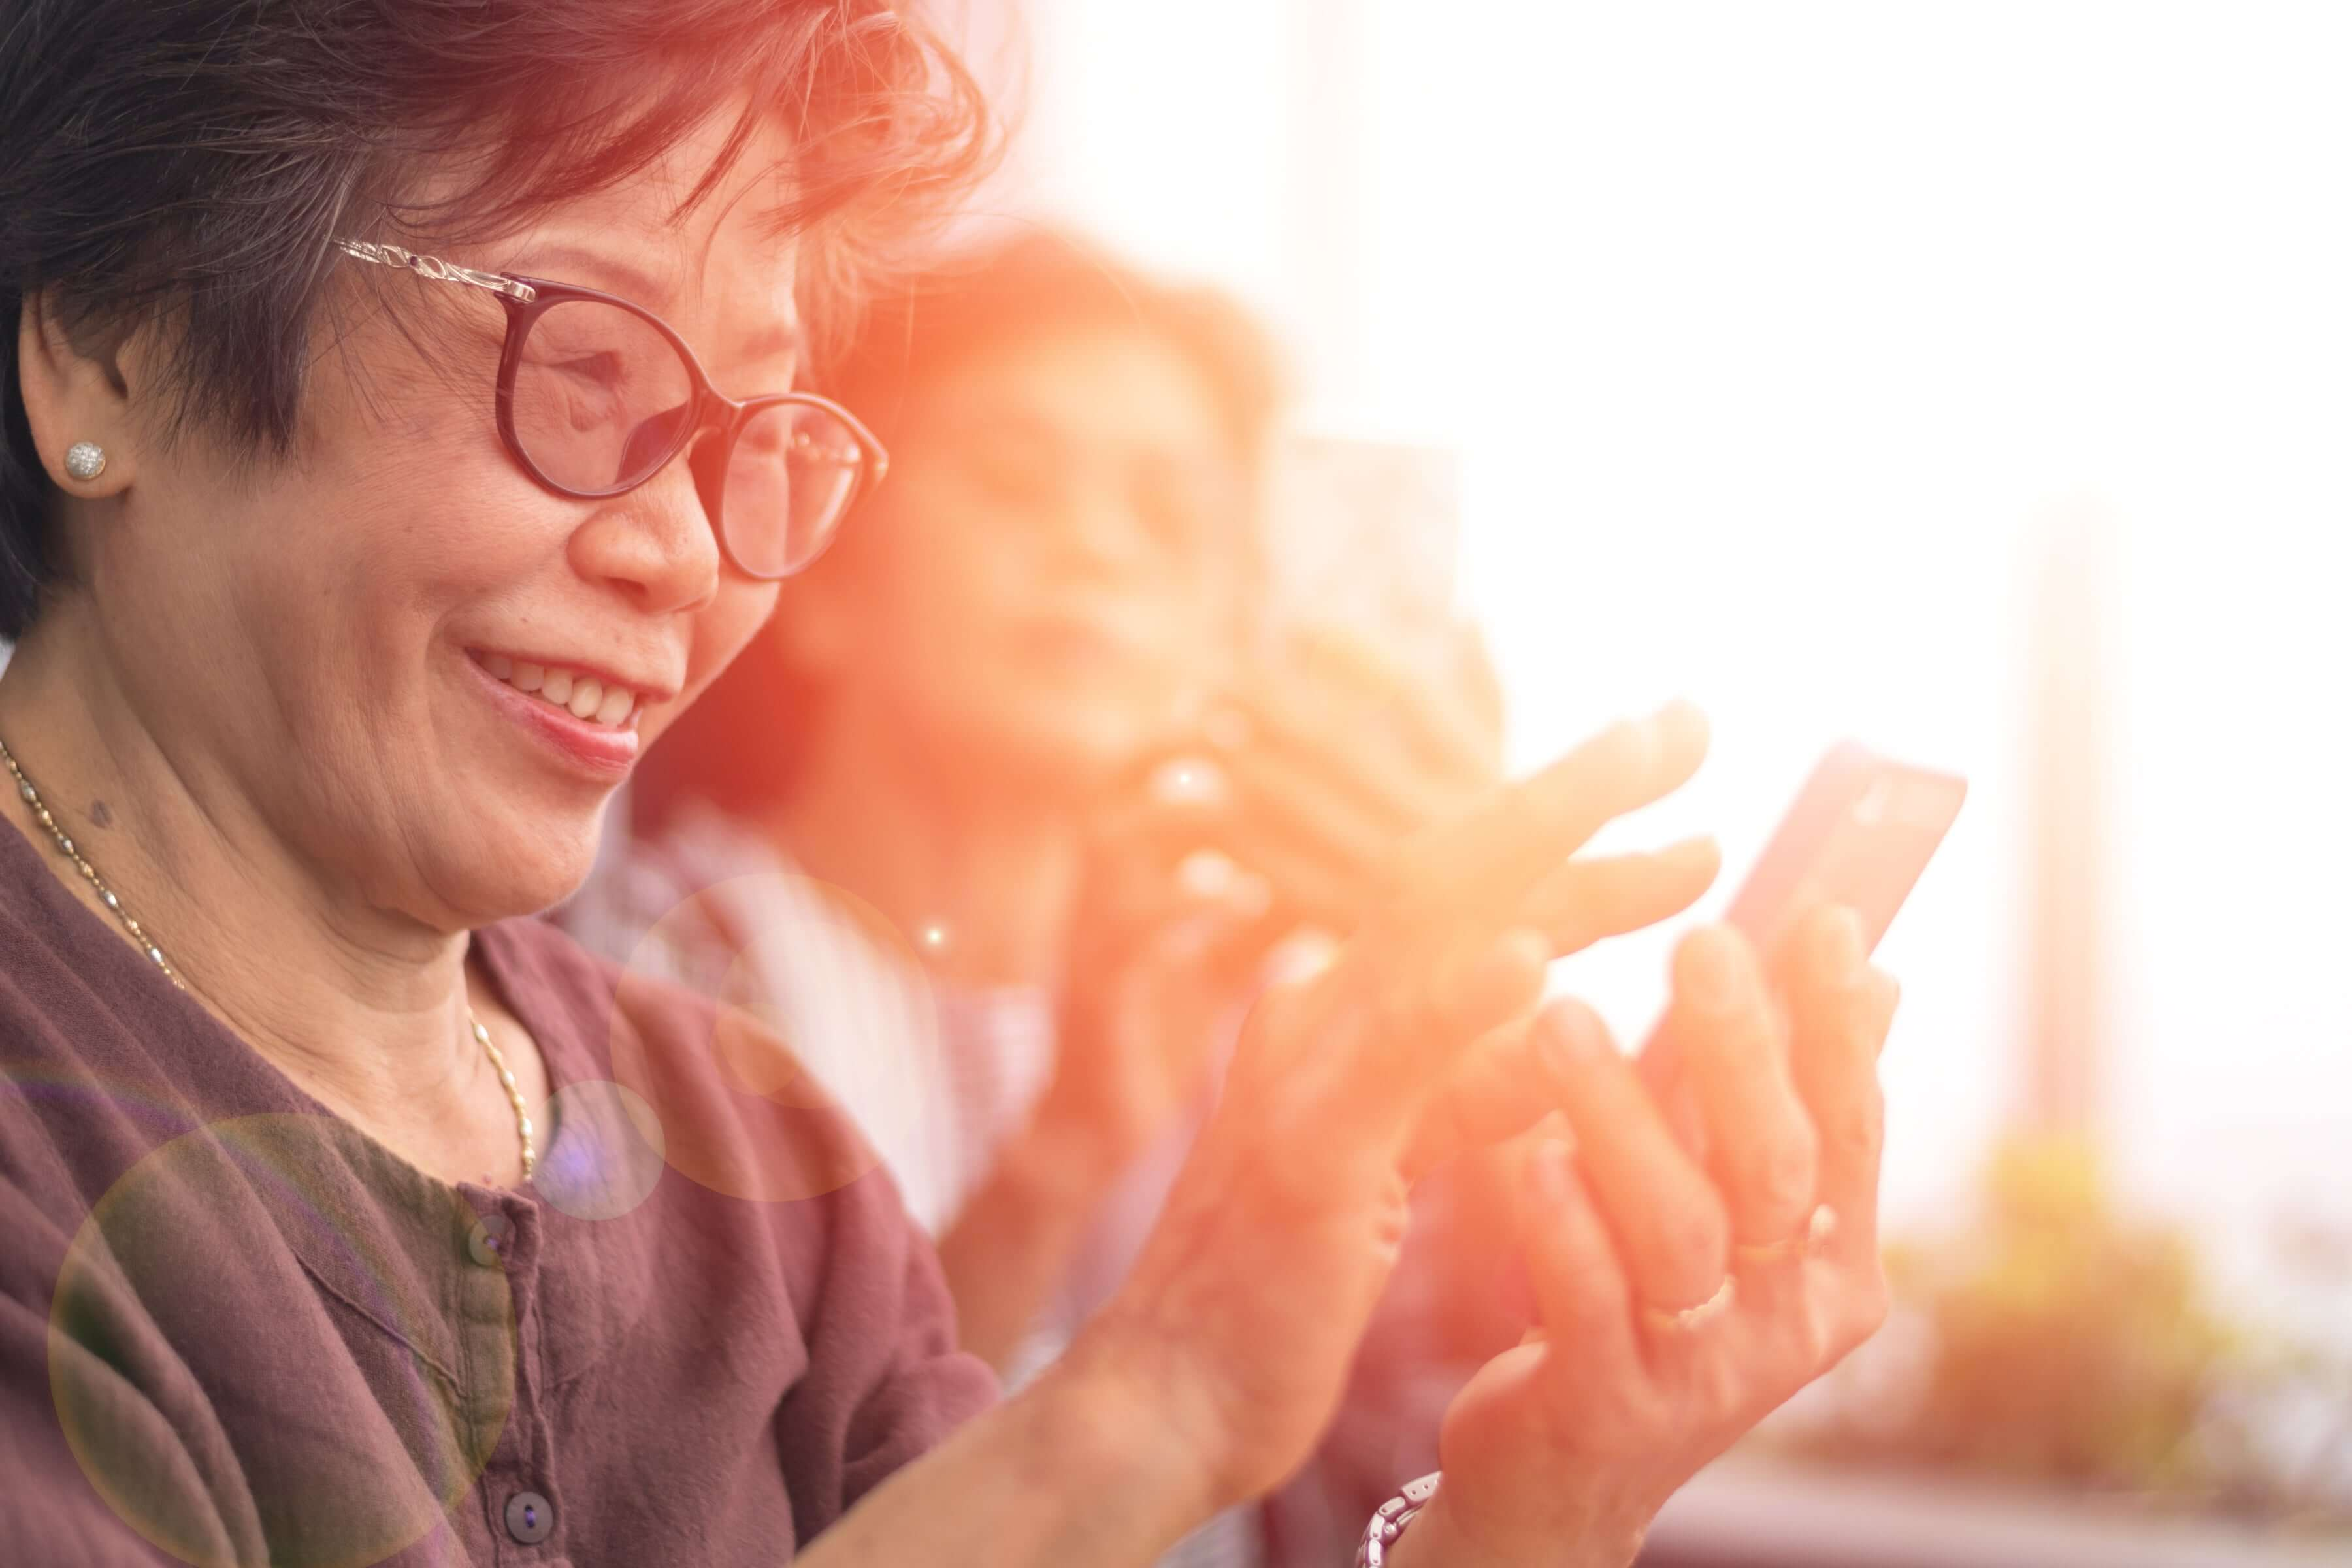 Why Choose InteliChart's Patient Engagement Platform?